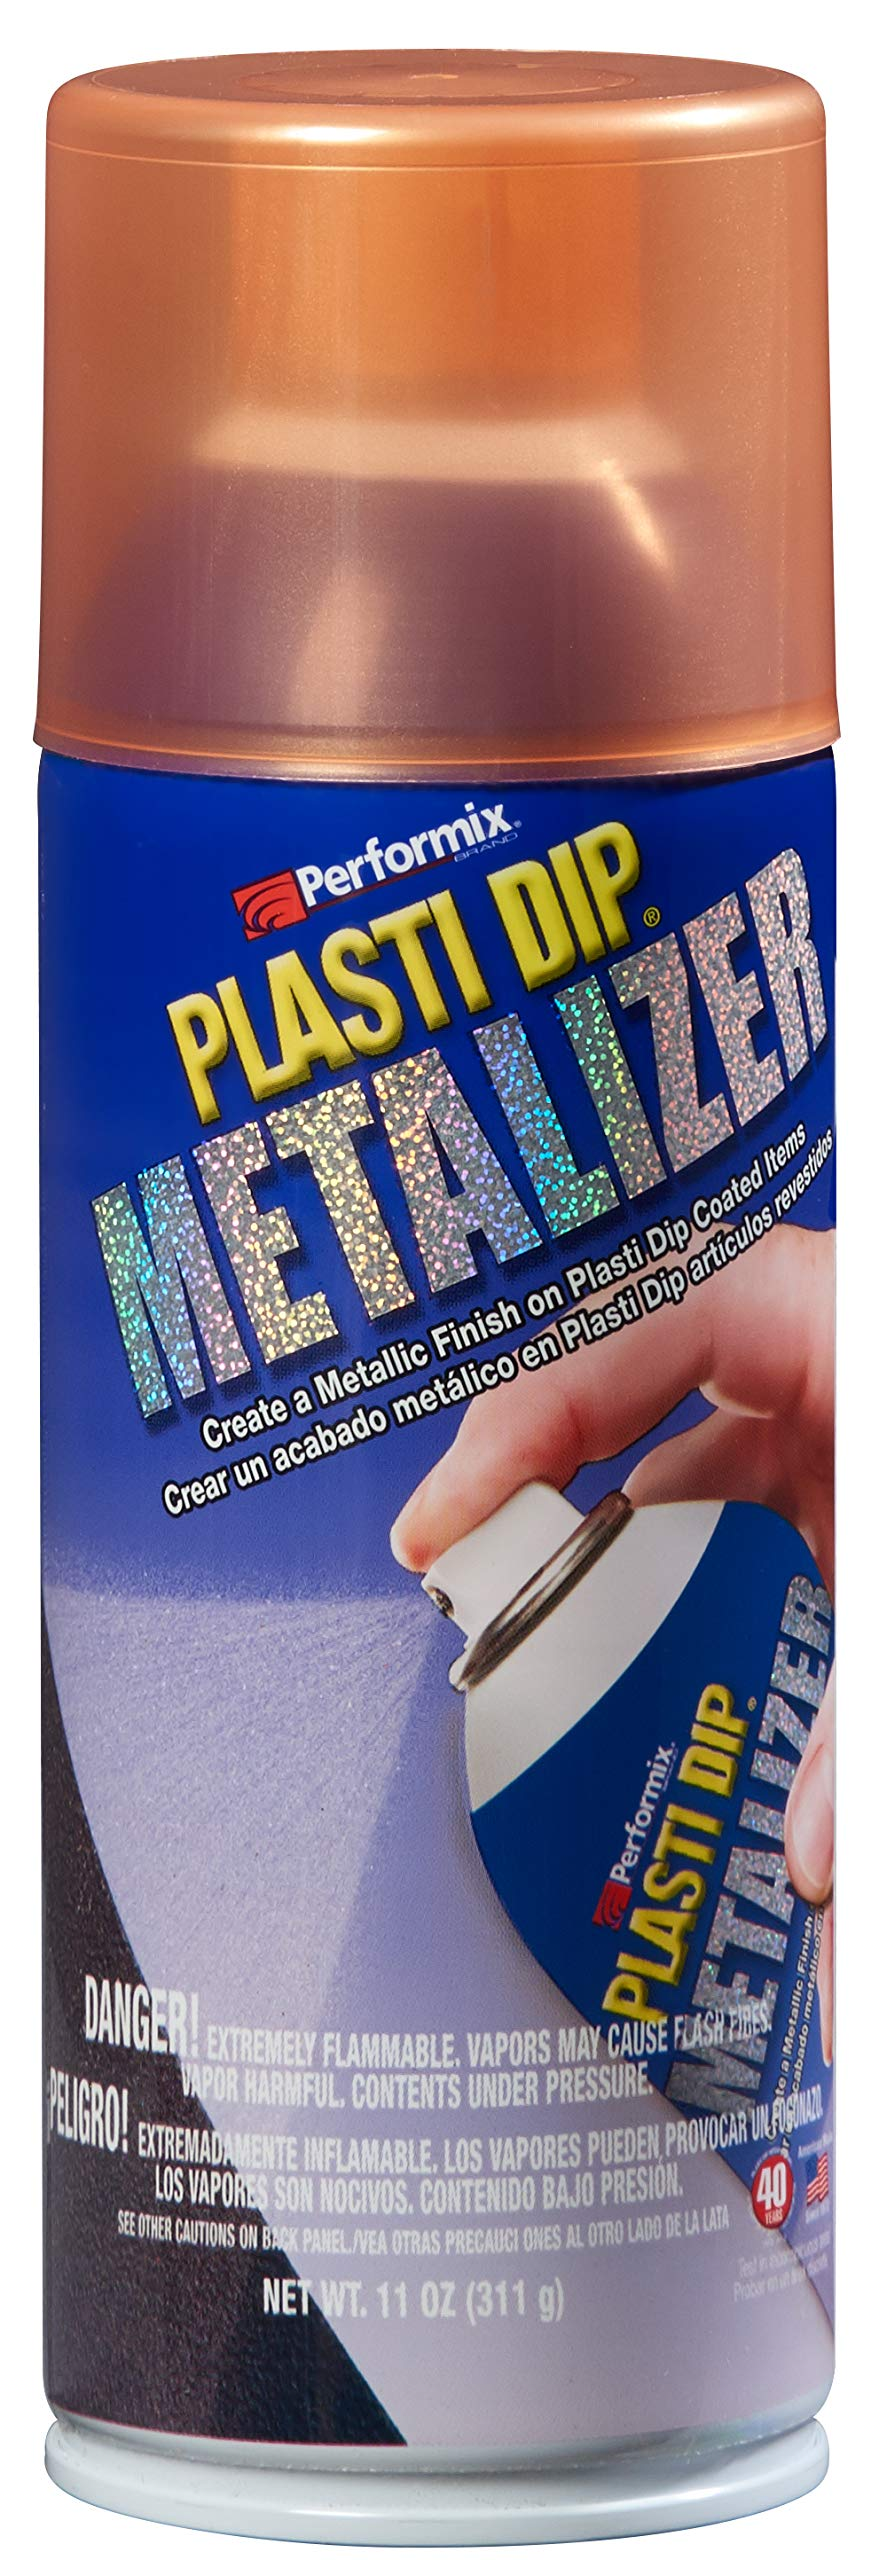 Plasti Dip Performix (11236-6-6PK) Copper Metalizer Enhancer - 11 oz. Aerosol, (Pack of 6)